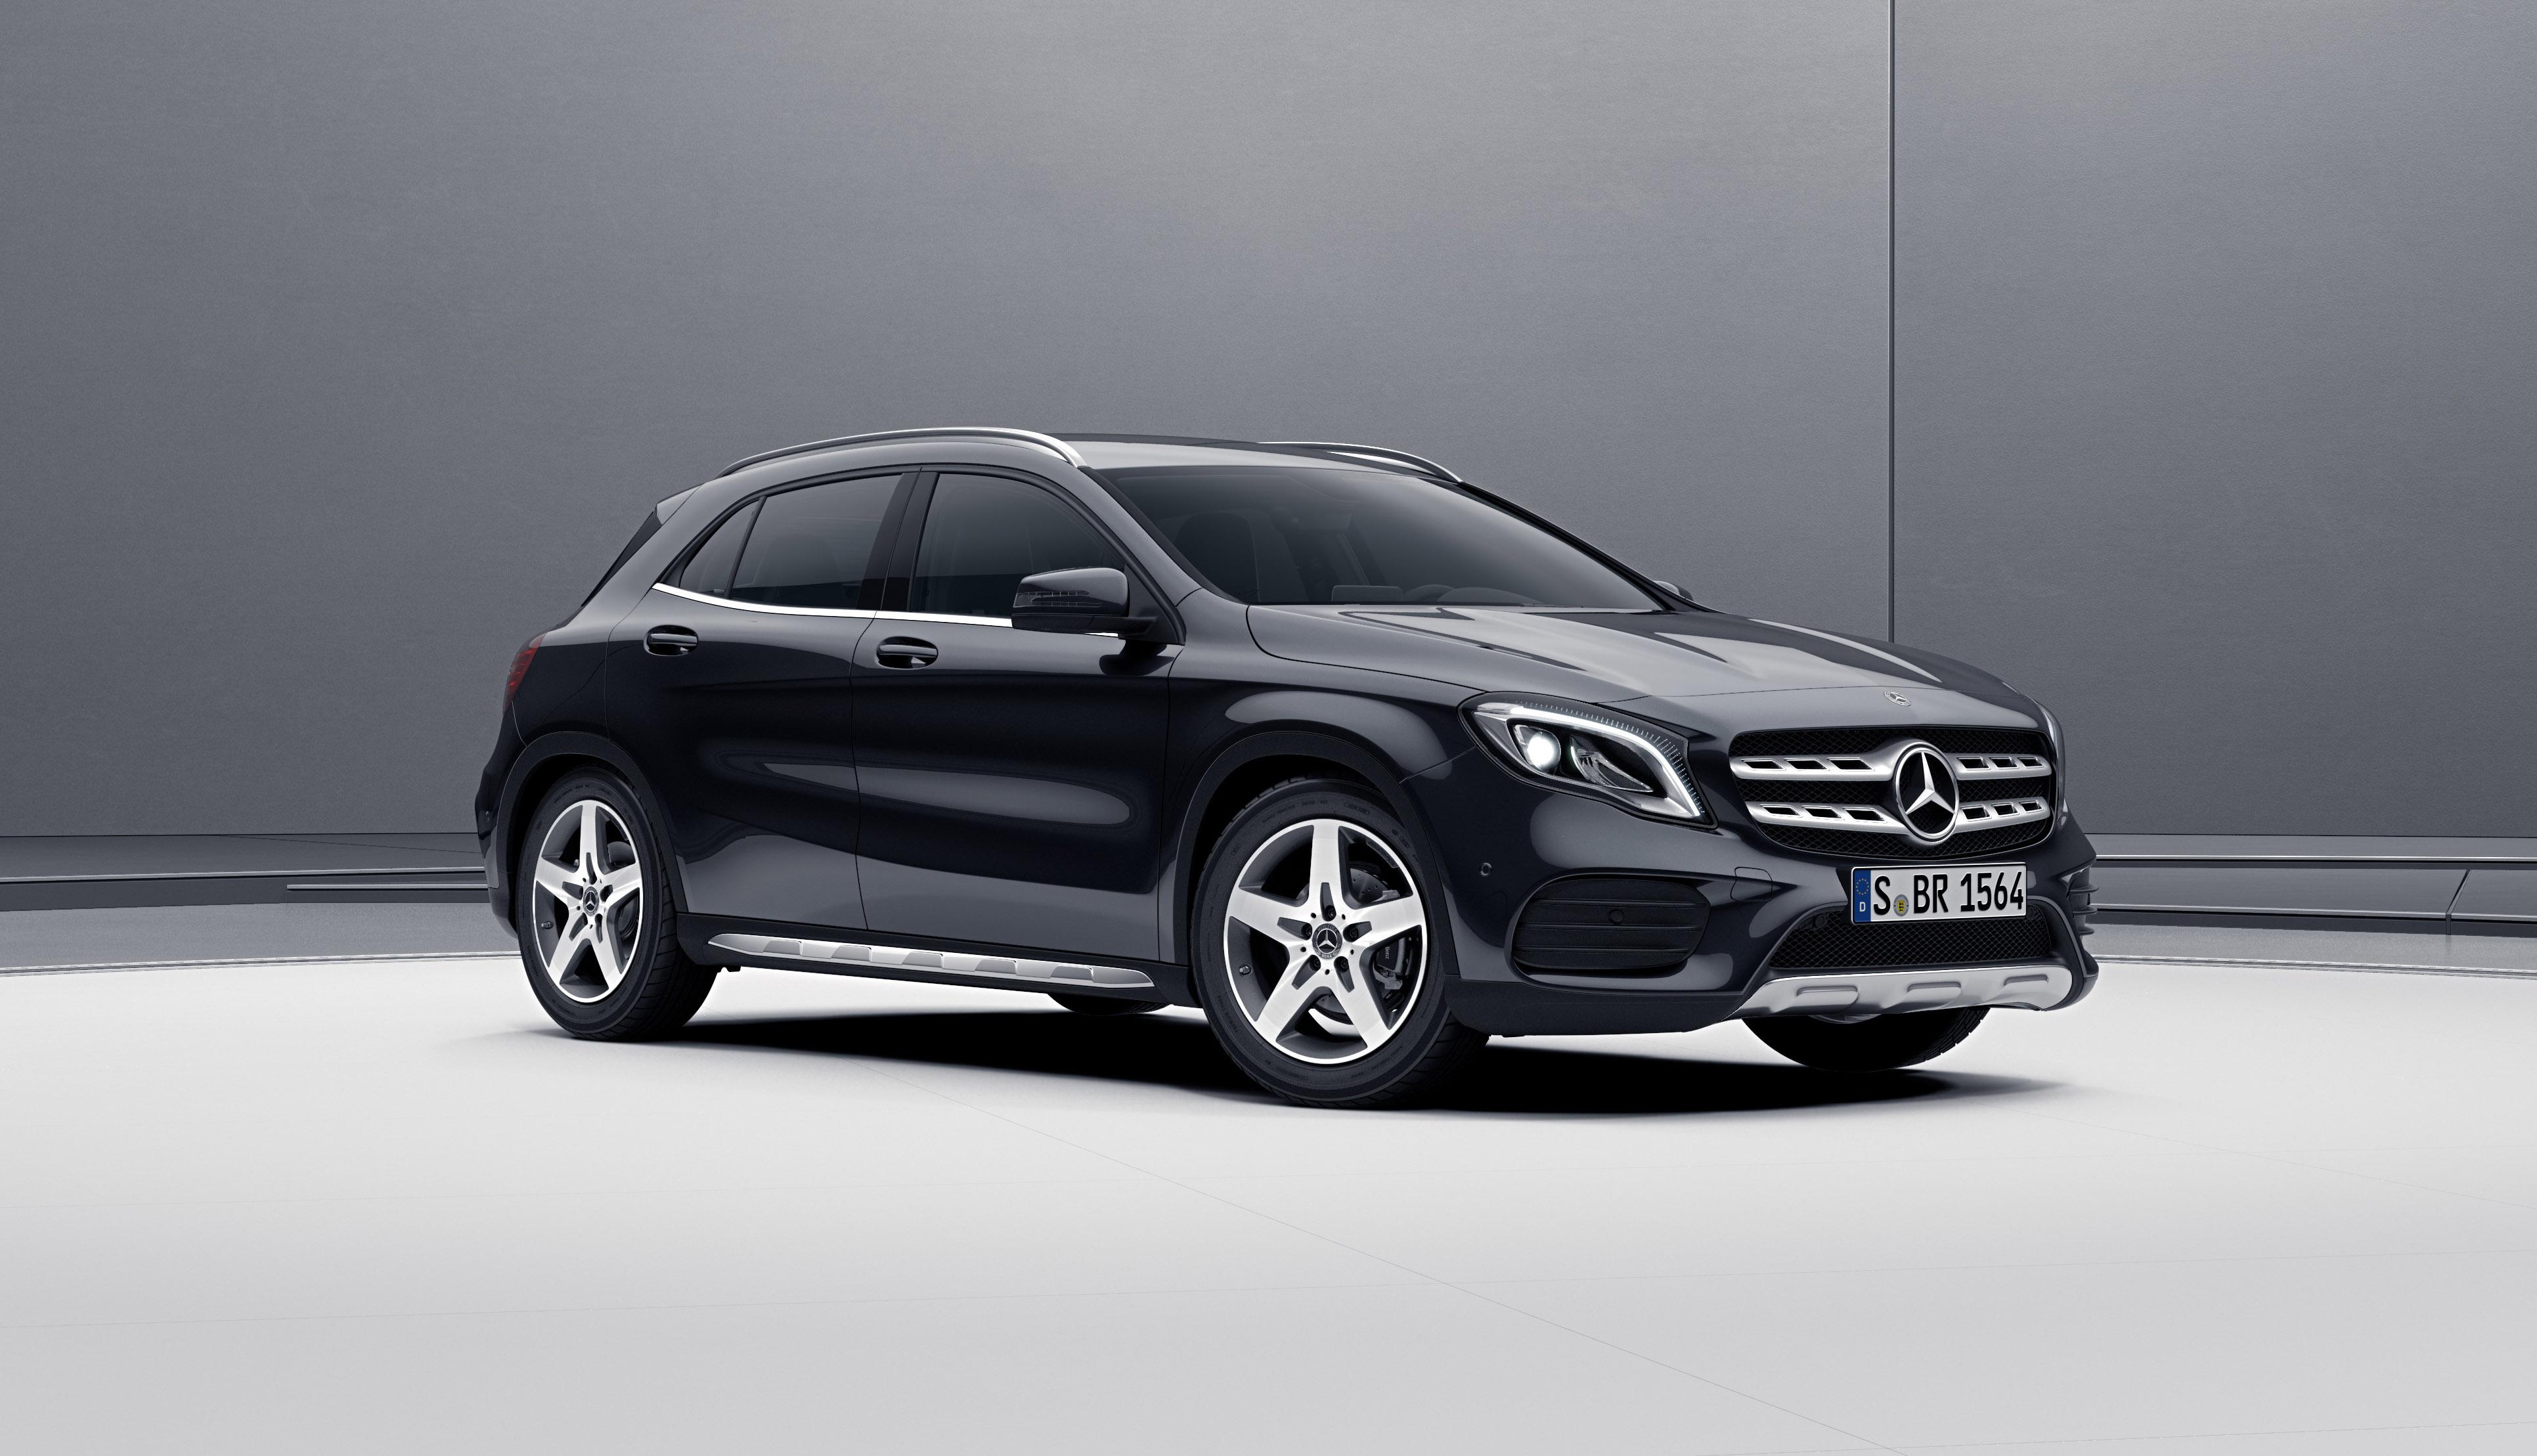 New 2017 mercedes benz gla gla250 suv m1704538 mercedes for Mercedes benz canada inventory